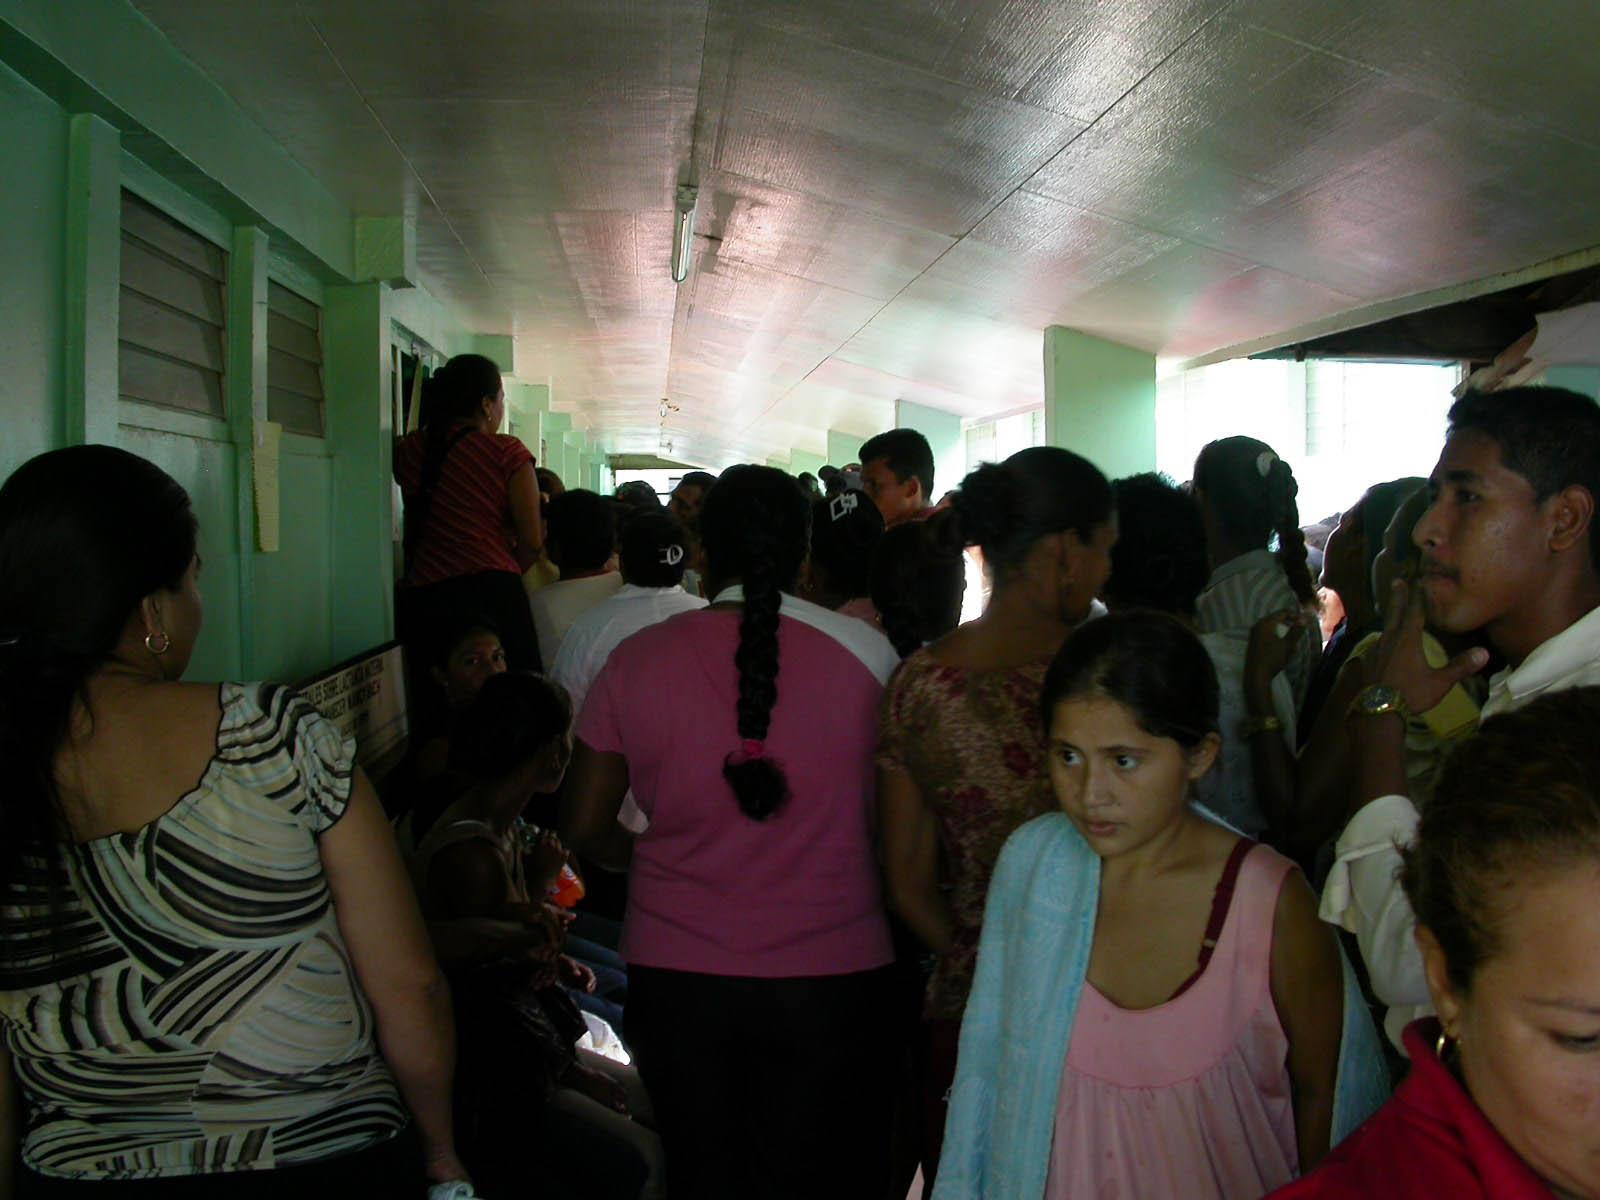 nicaragua2006-34.jpg